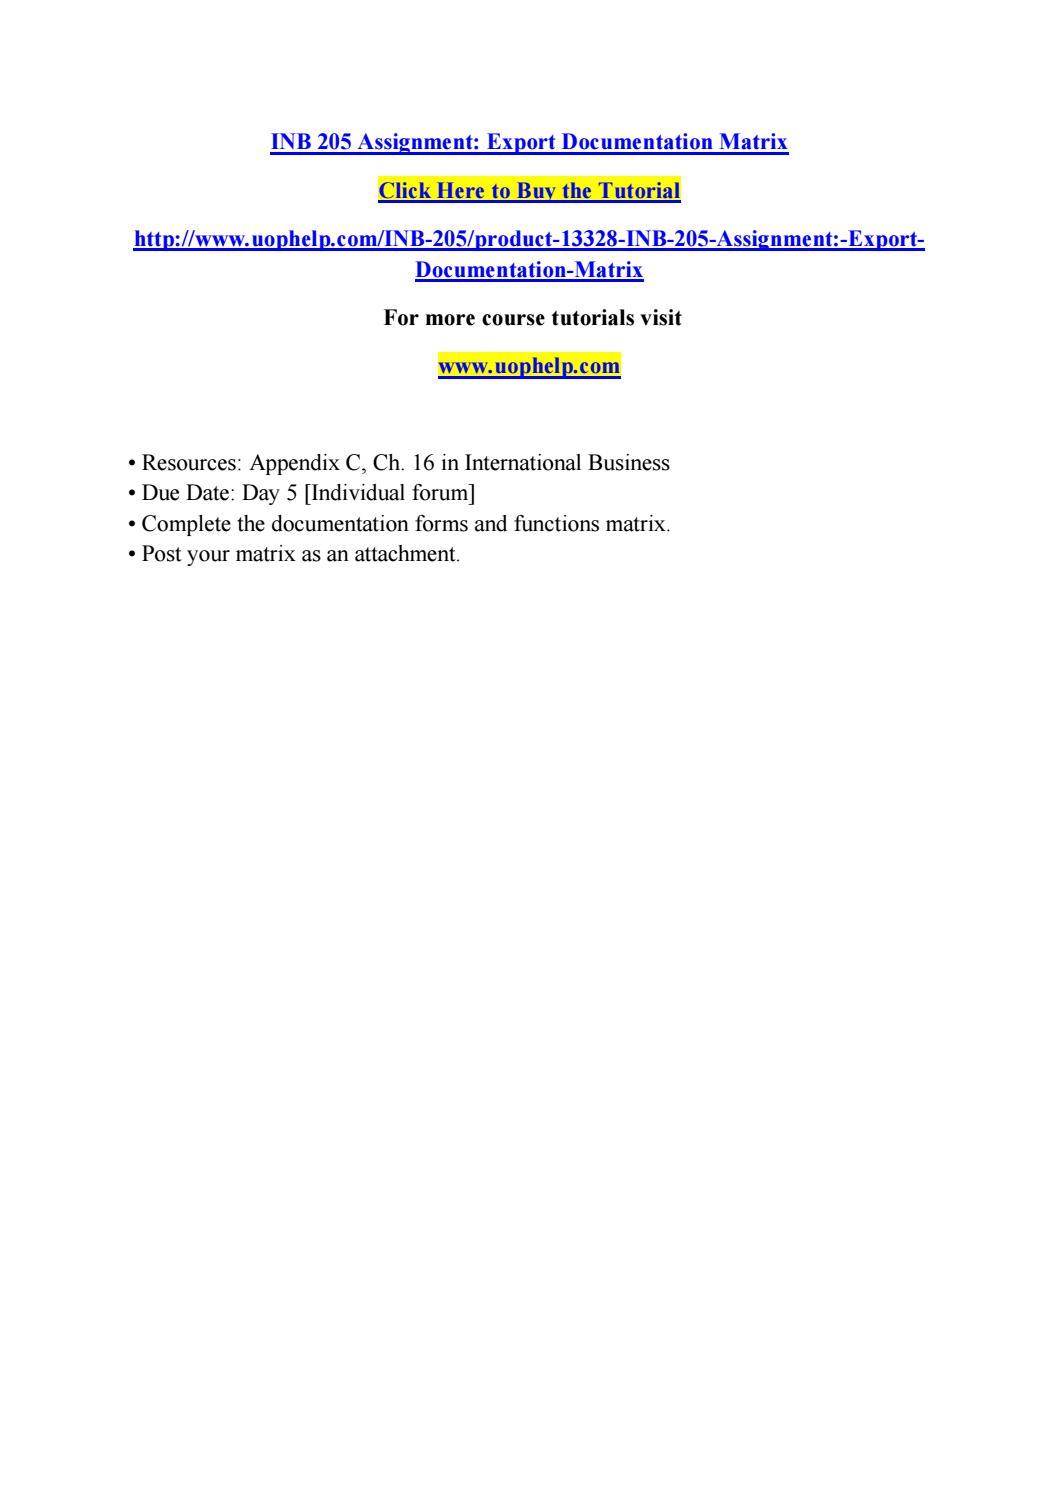 Automatism law teacher essay